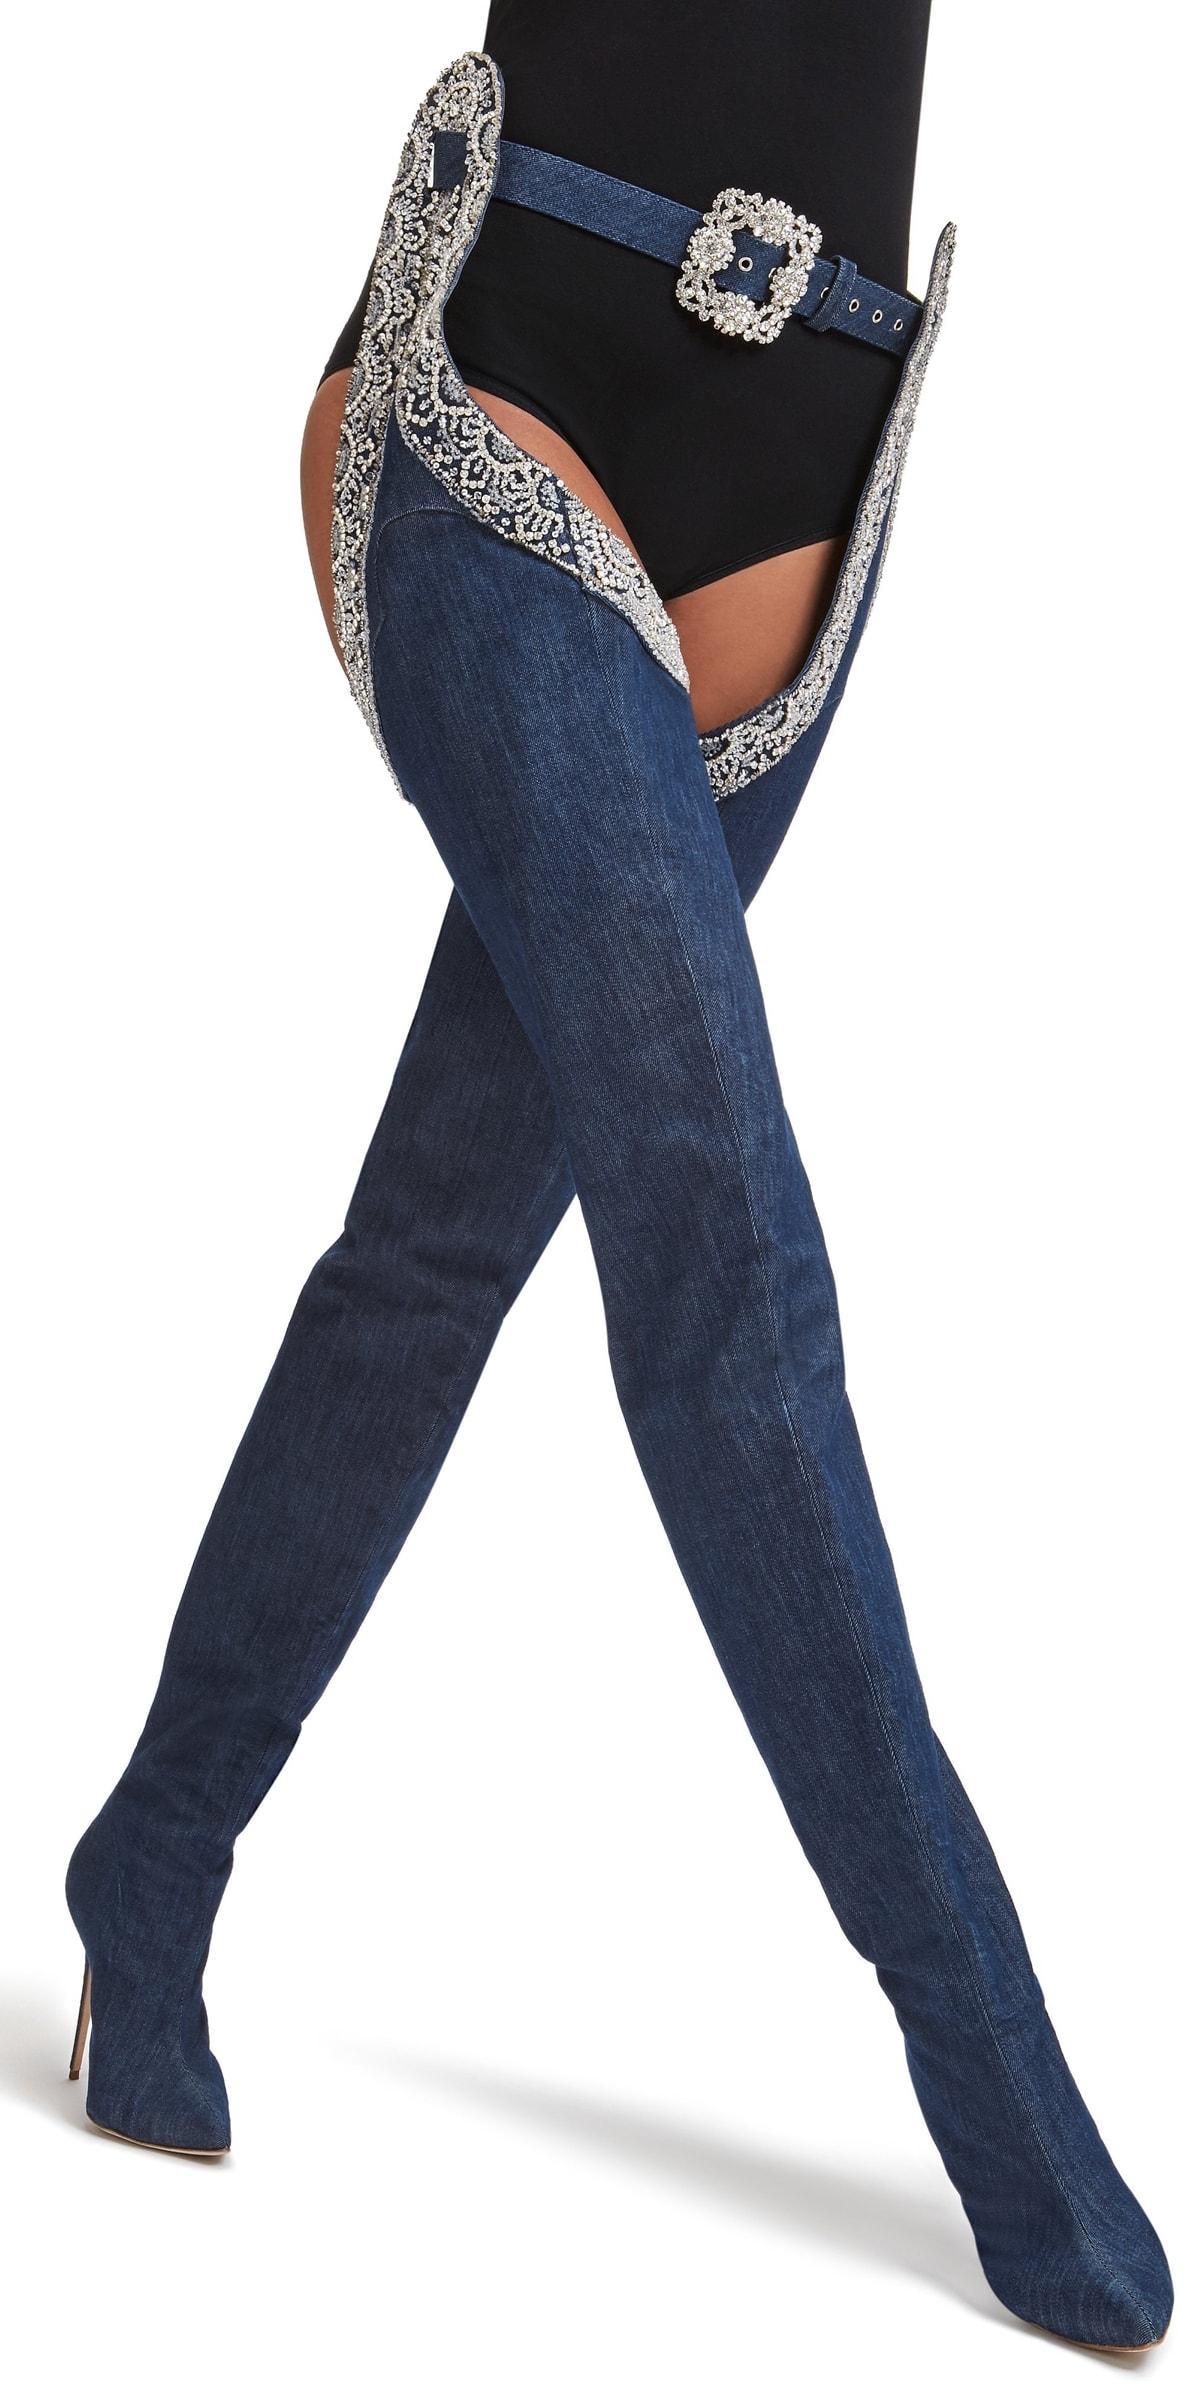 Rihanna's 9-to-5 Manolo Blahnik denim boots